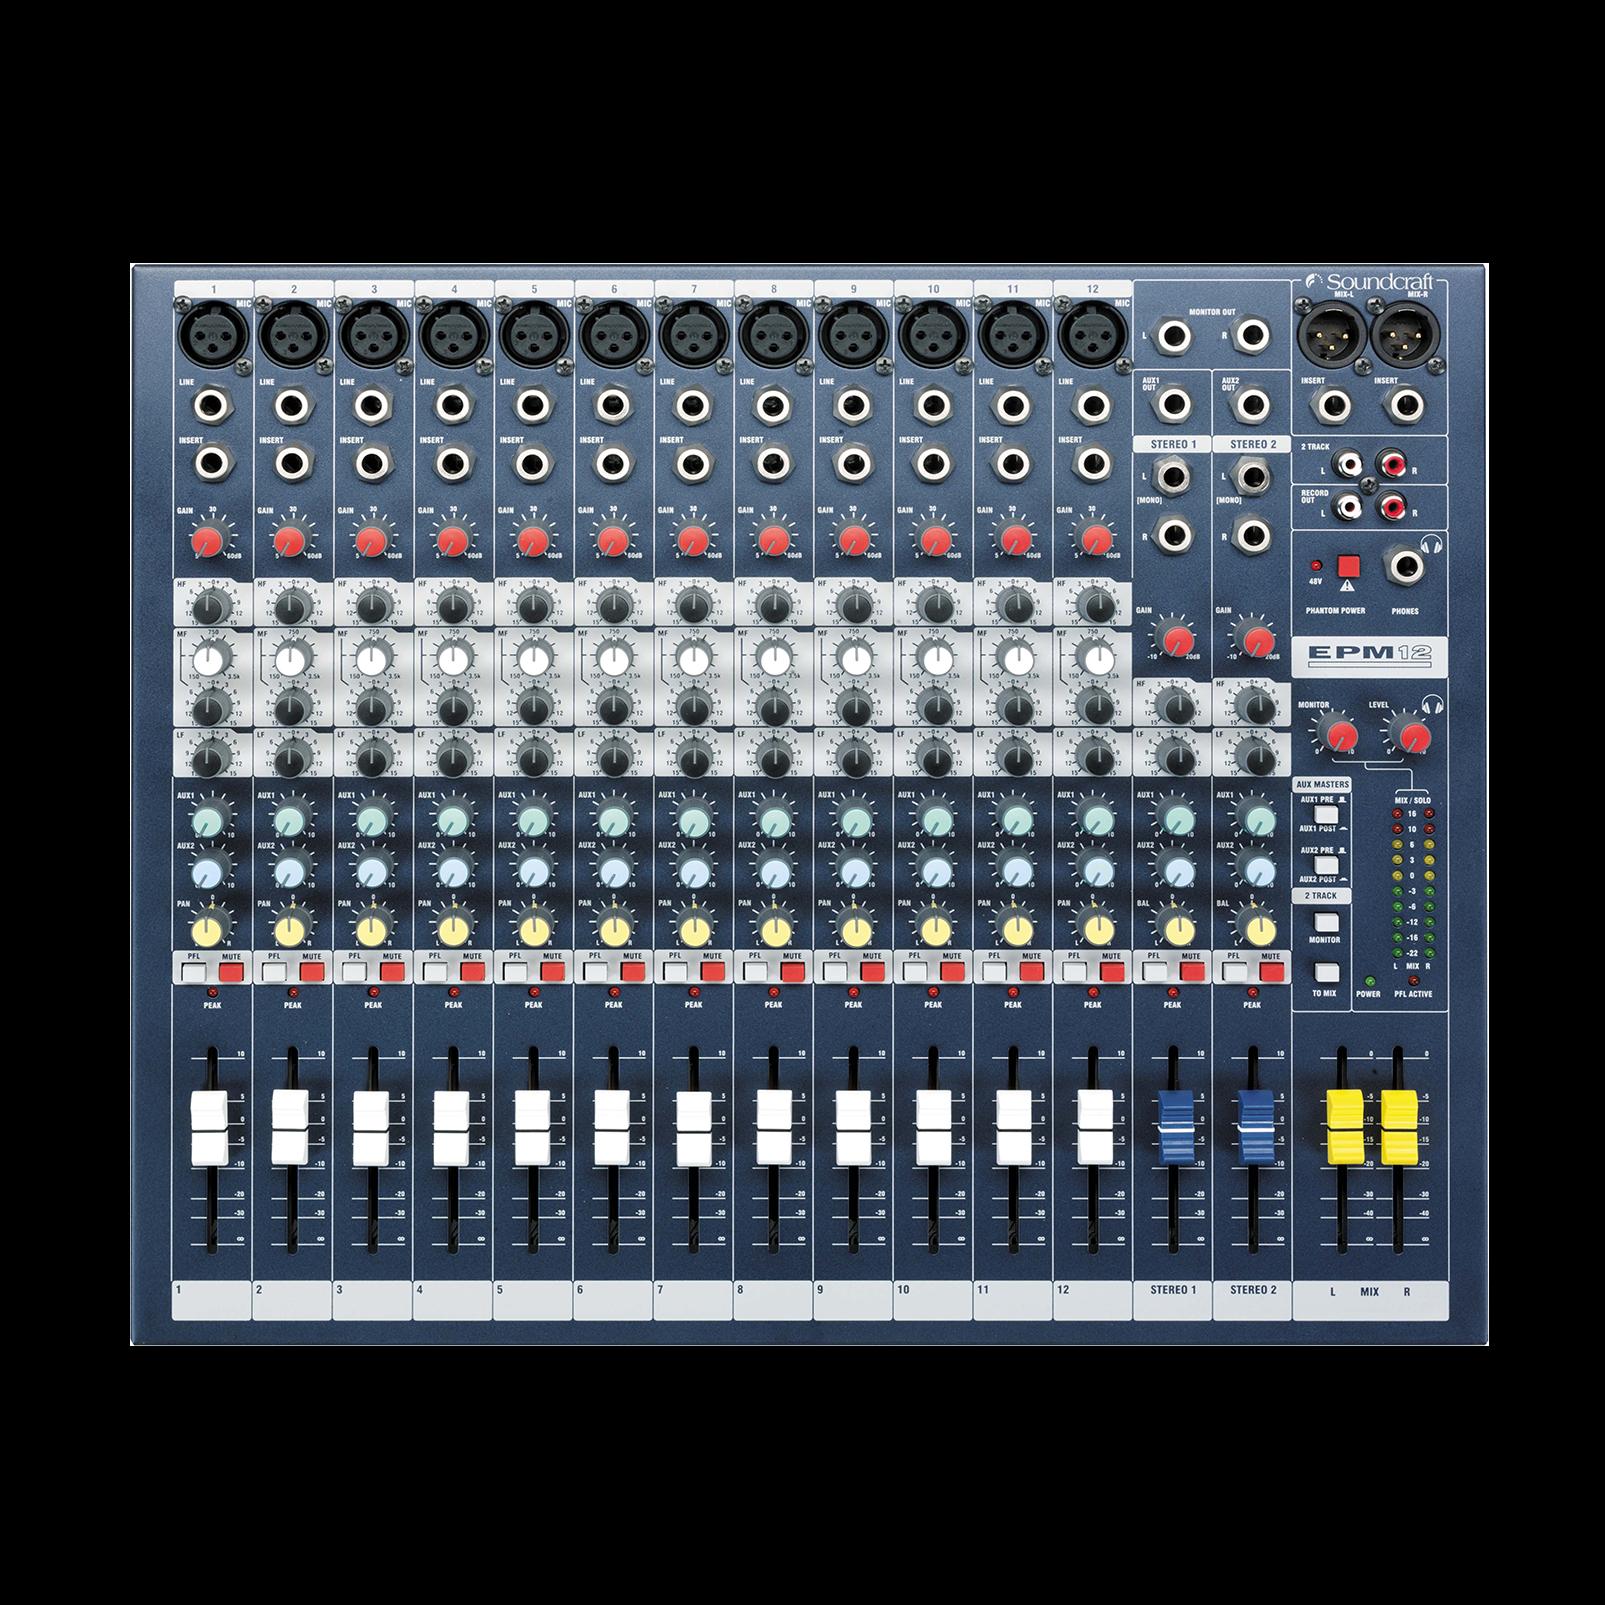 EPM12 - Dark Blue - A multipurpose mixer that carries the hallmarks of Soundcraft's professional heritage. - Detailshot 2